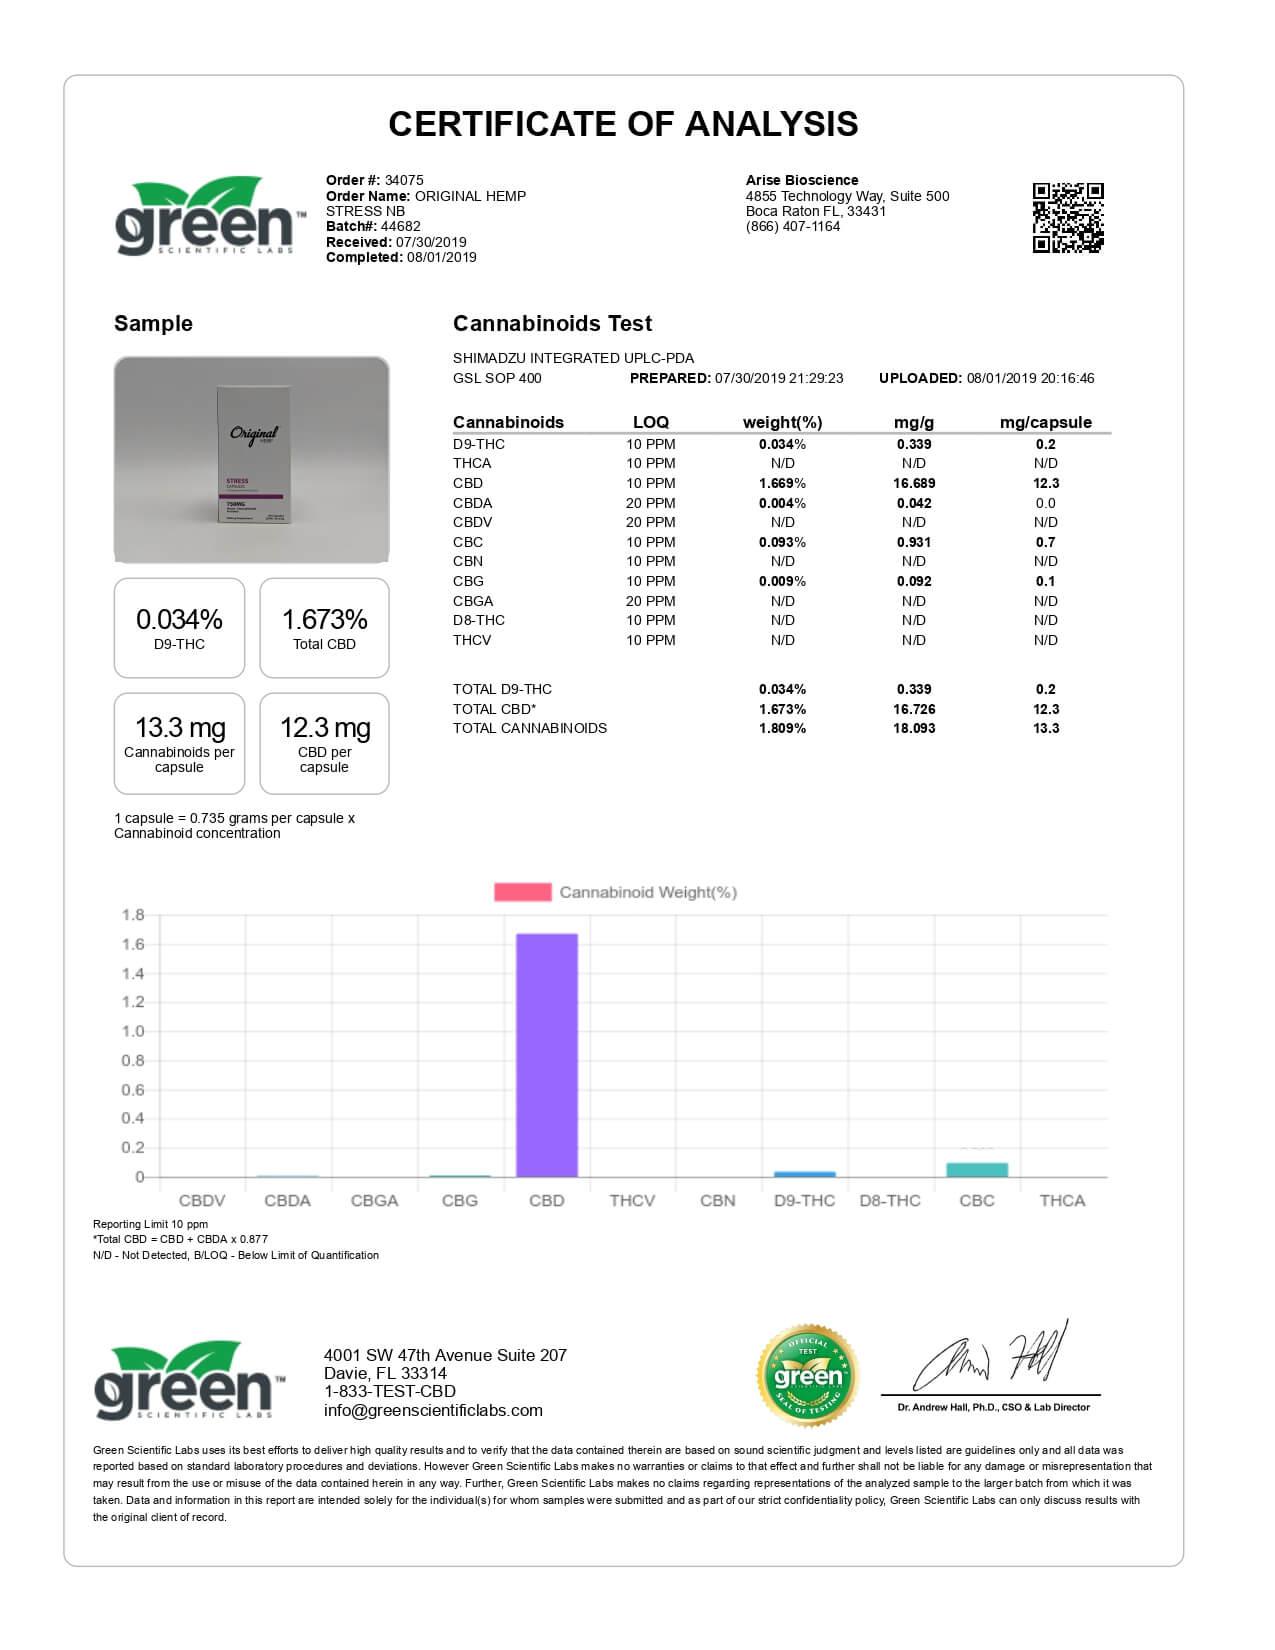 Original Hemp CBD Capsule Stress 25mg Lab Report